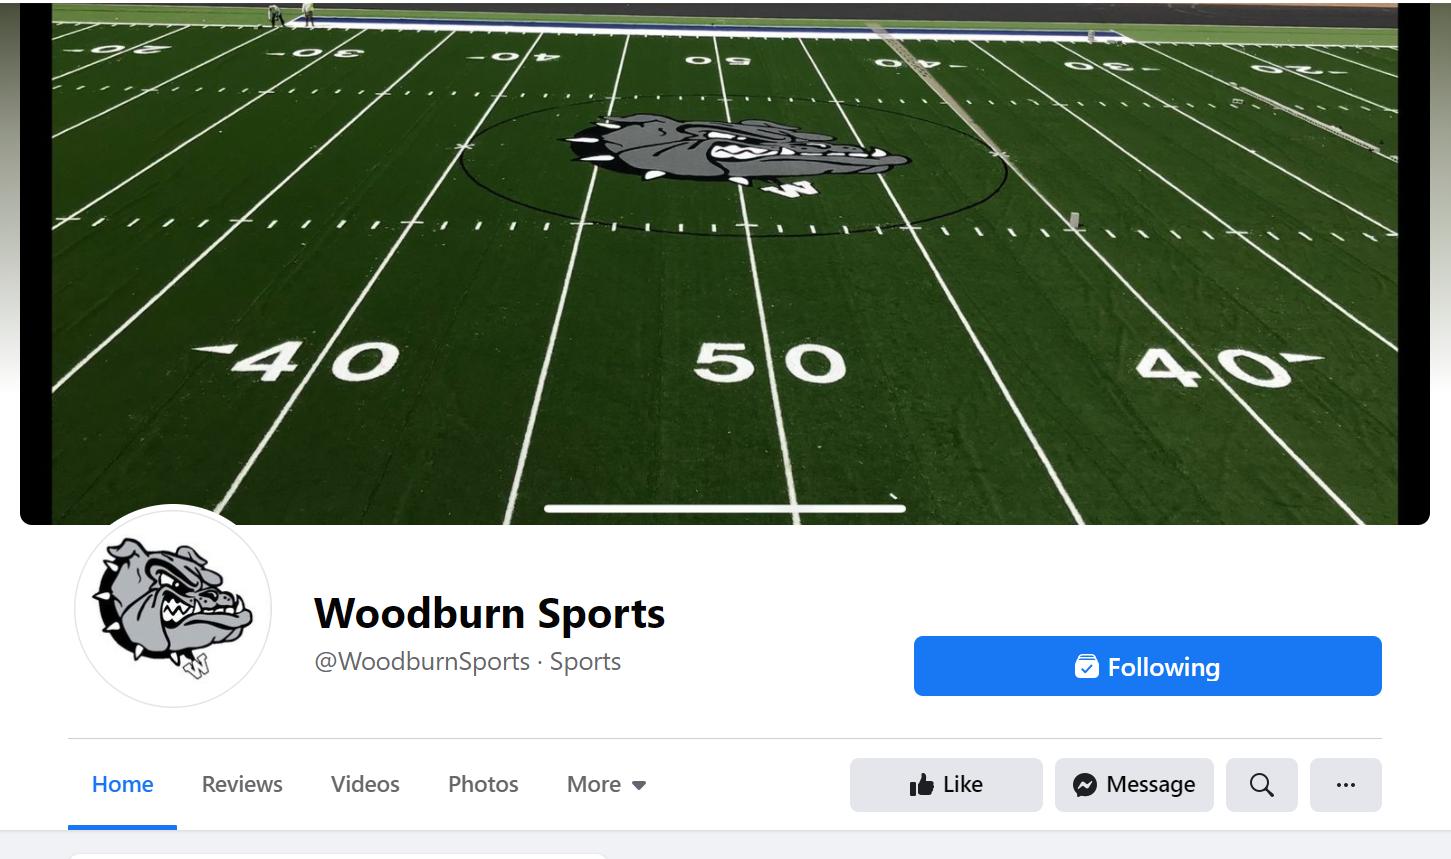 Follow us on Facebook @WoodburnSports